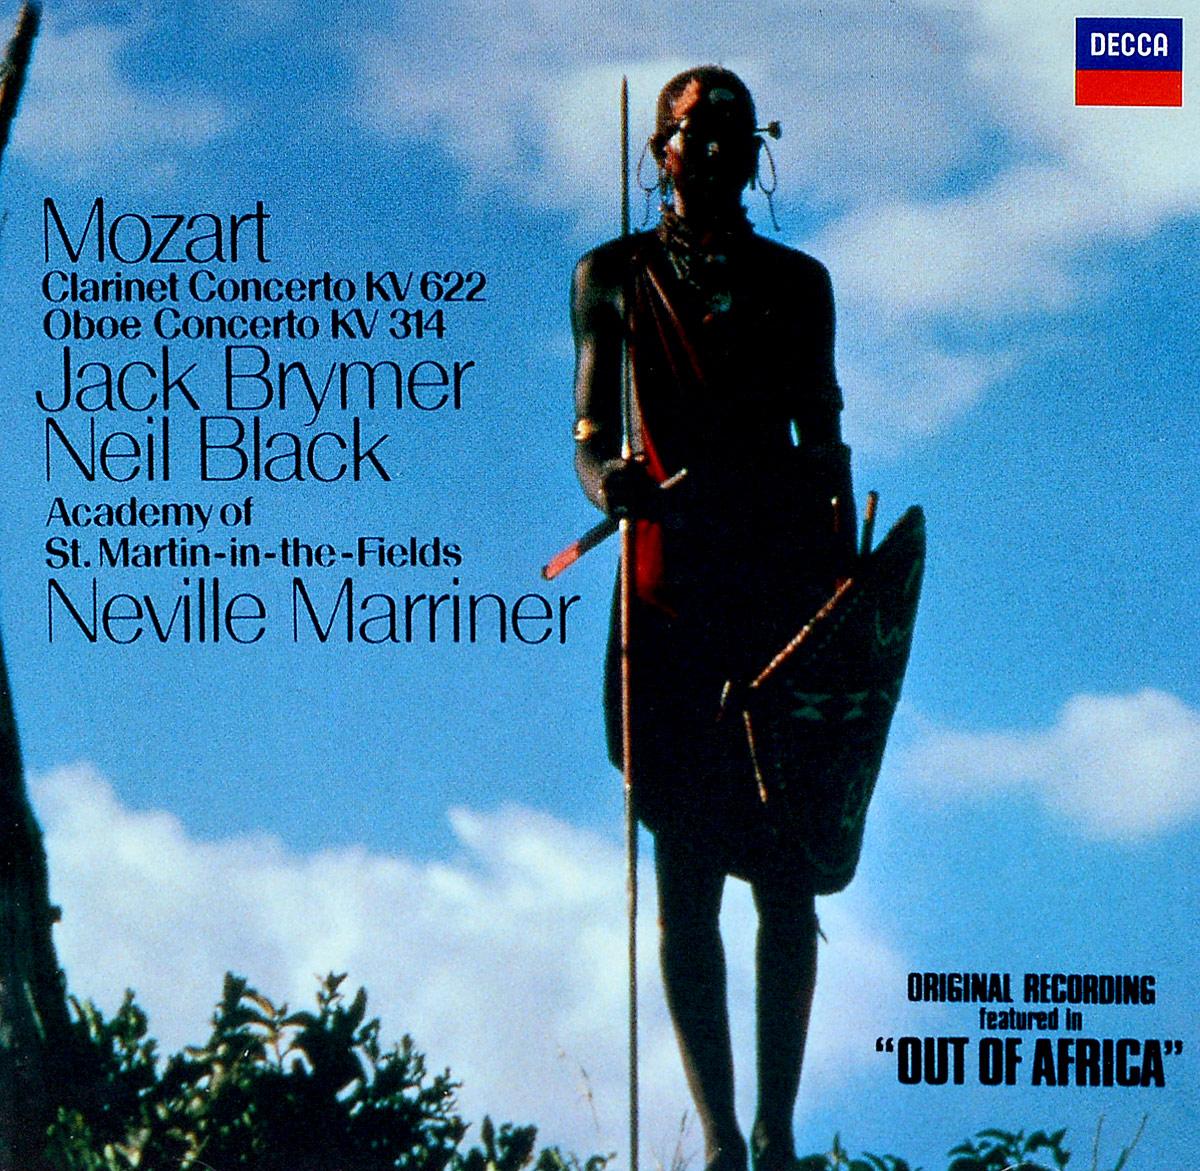 Джек Браймер,Нэвилл Мерринер Jack Brymer, Sir Neville Marriner. Mozart: Clarinet Concerto / Oboe Concerto sir neville marriner faure requiem